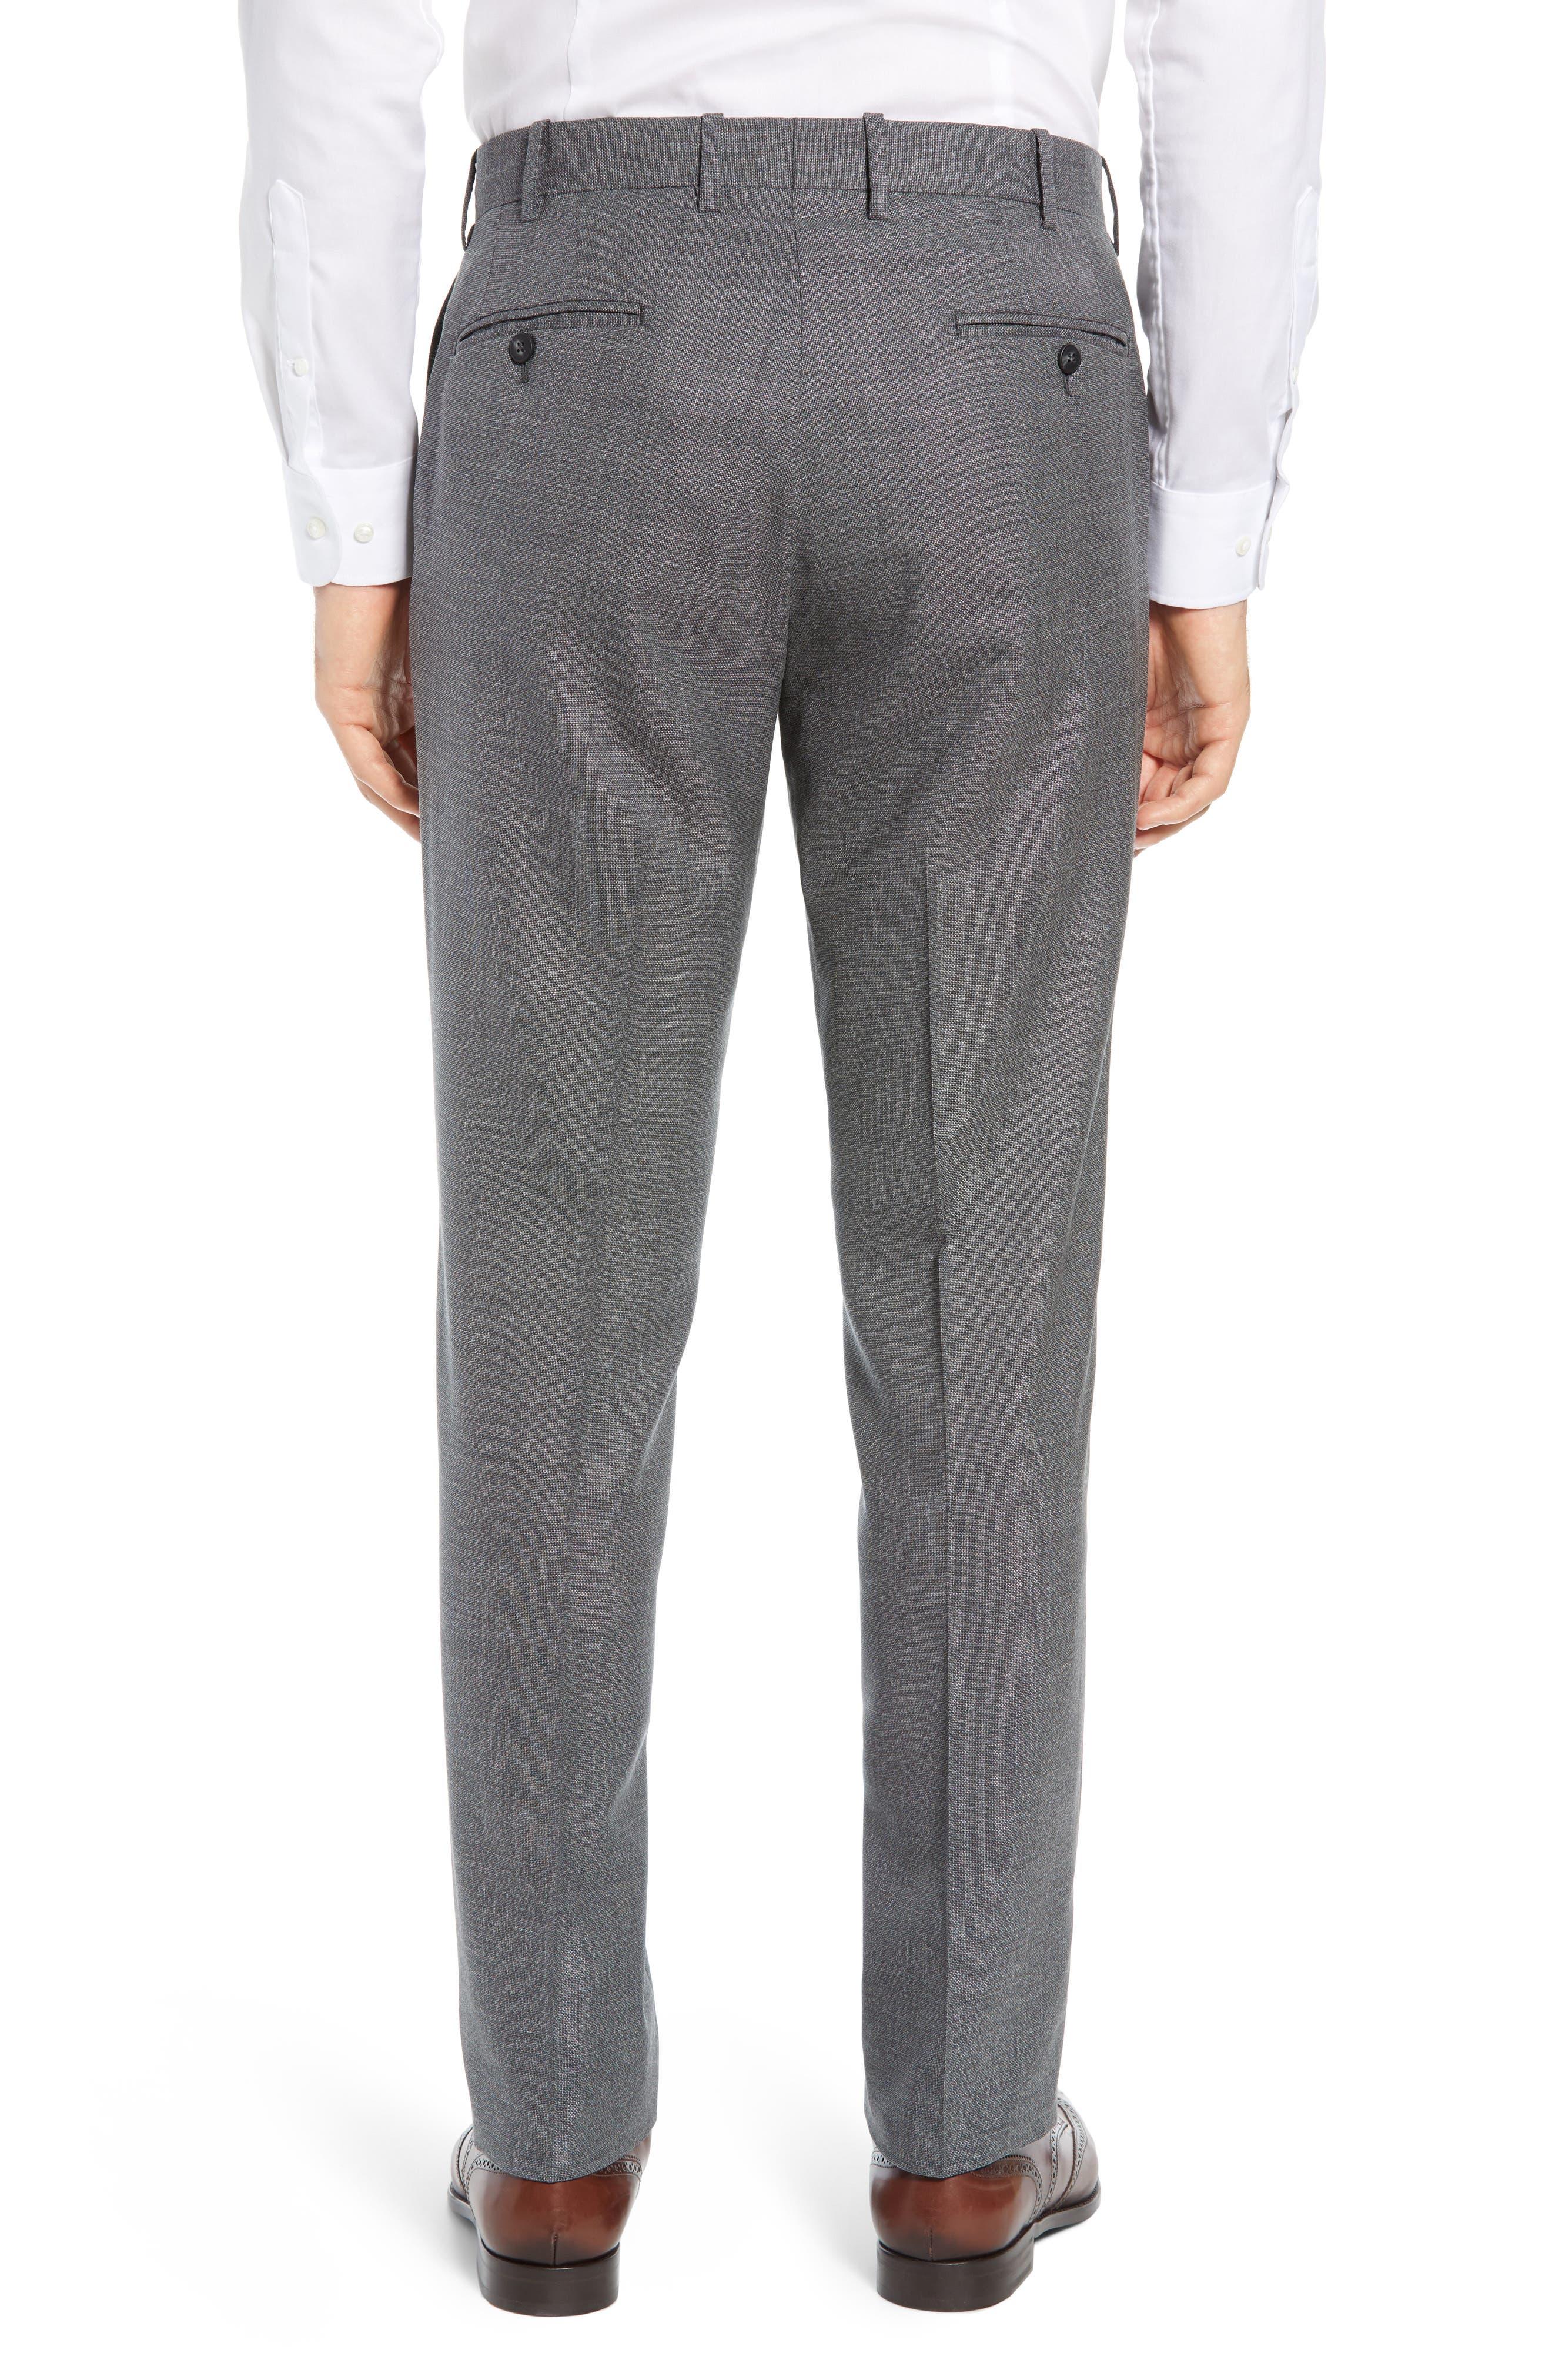 JOHN W. NORDSTROM<SUP>®</SUP>, Torino Flat Front Solid Wool Trousers, Alternate thumbnail 2, color, GREY PHANTOM BASKET WEAVE